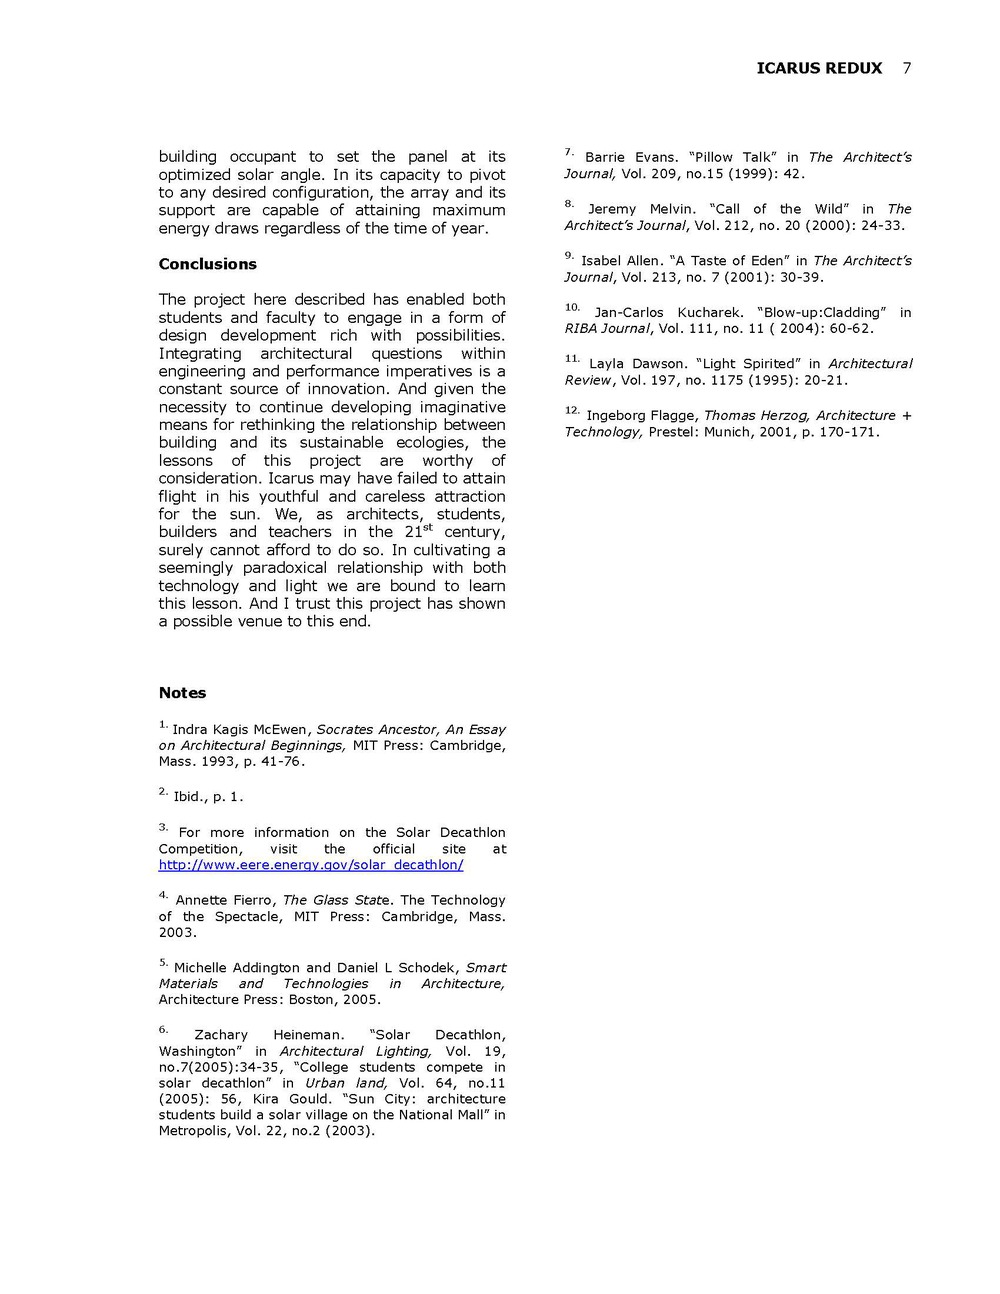 ACSA.2007.IcarusRedux2_Page_7.jpg